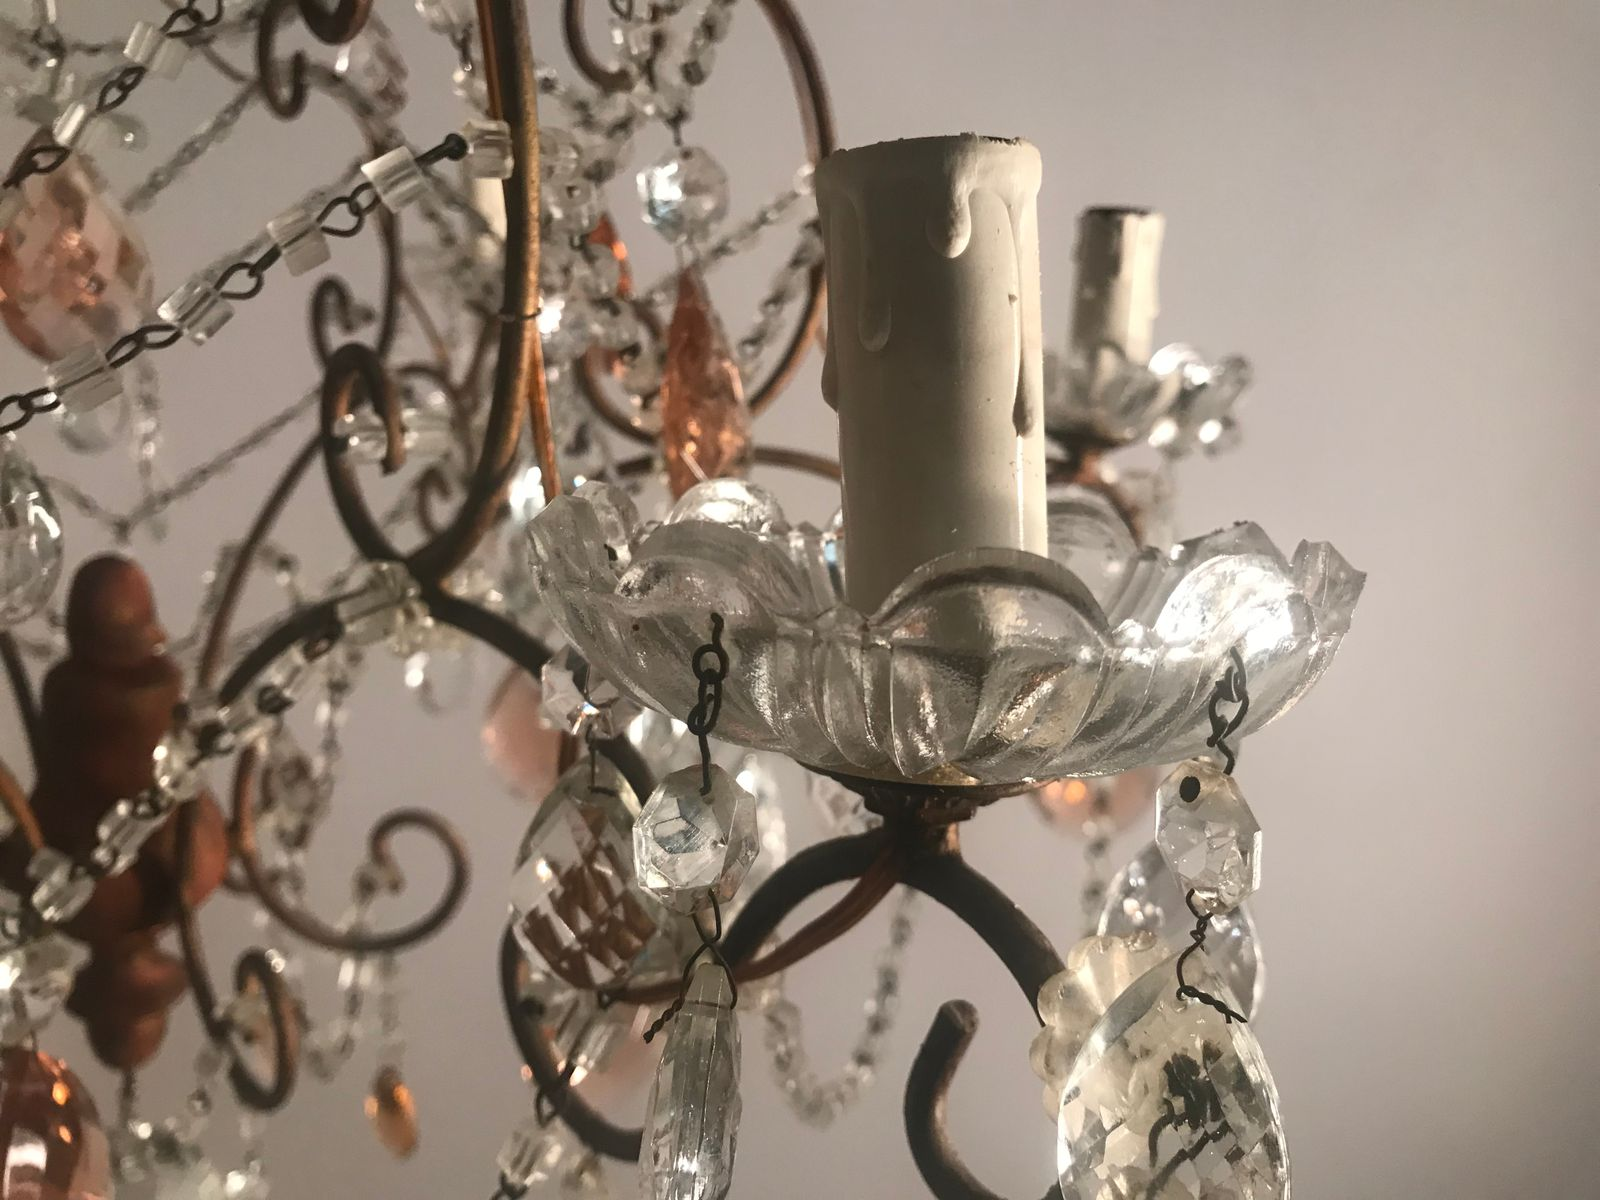 Lampadario Rosa Cristallo : Lampadario grande vintage con perle in cristallo e gocce